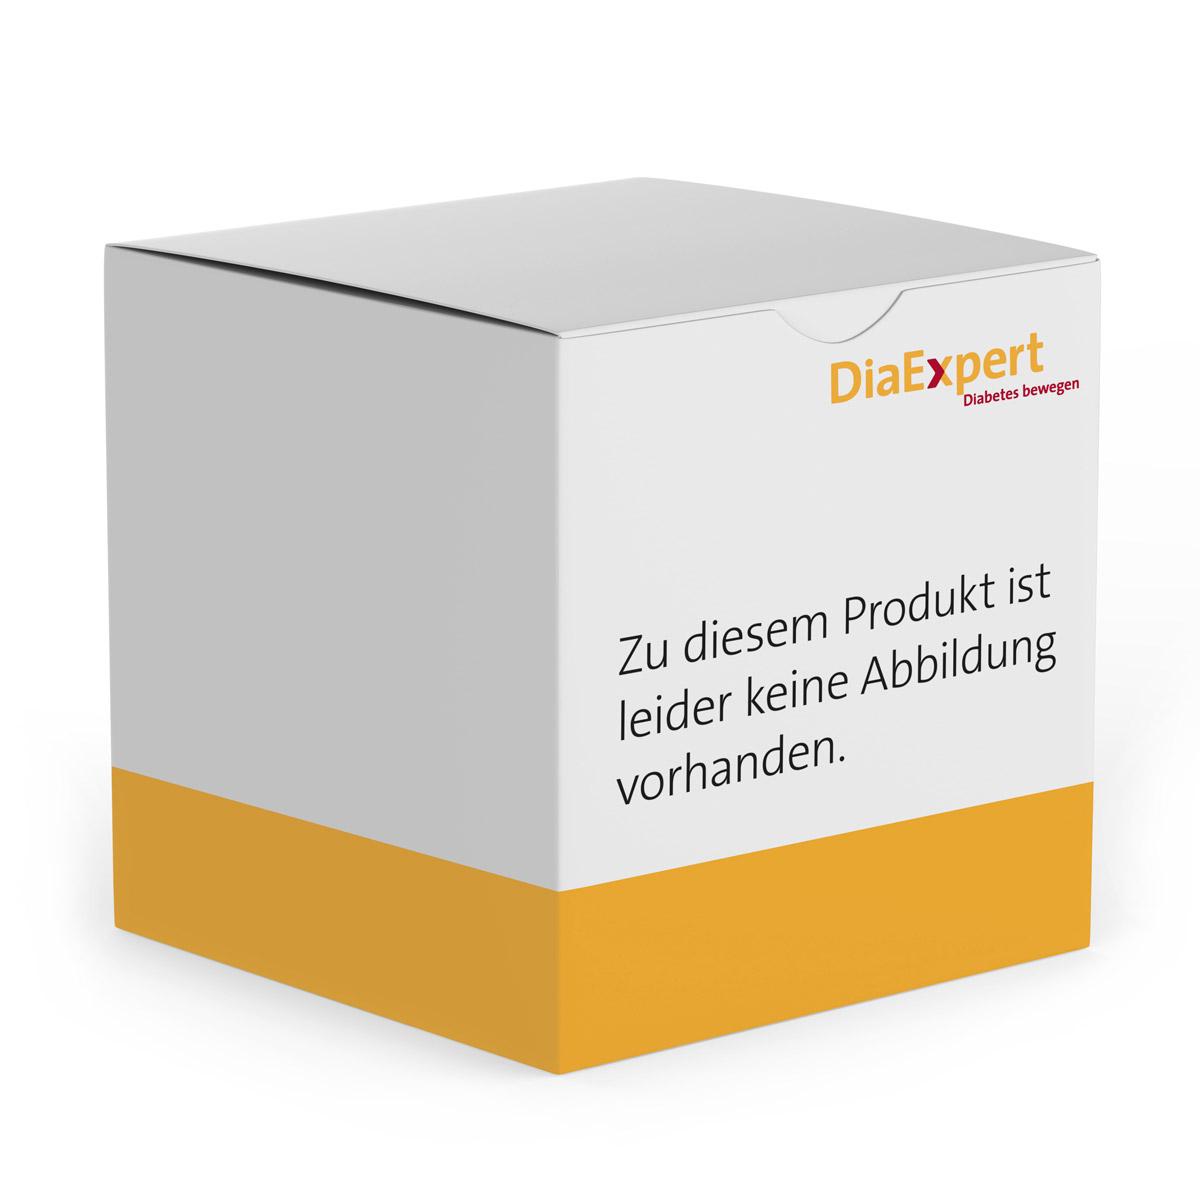 Medtronic MiniMed 670G mg/dL